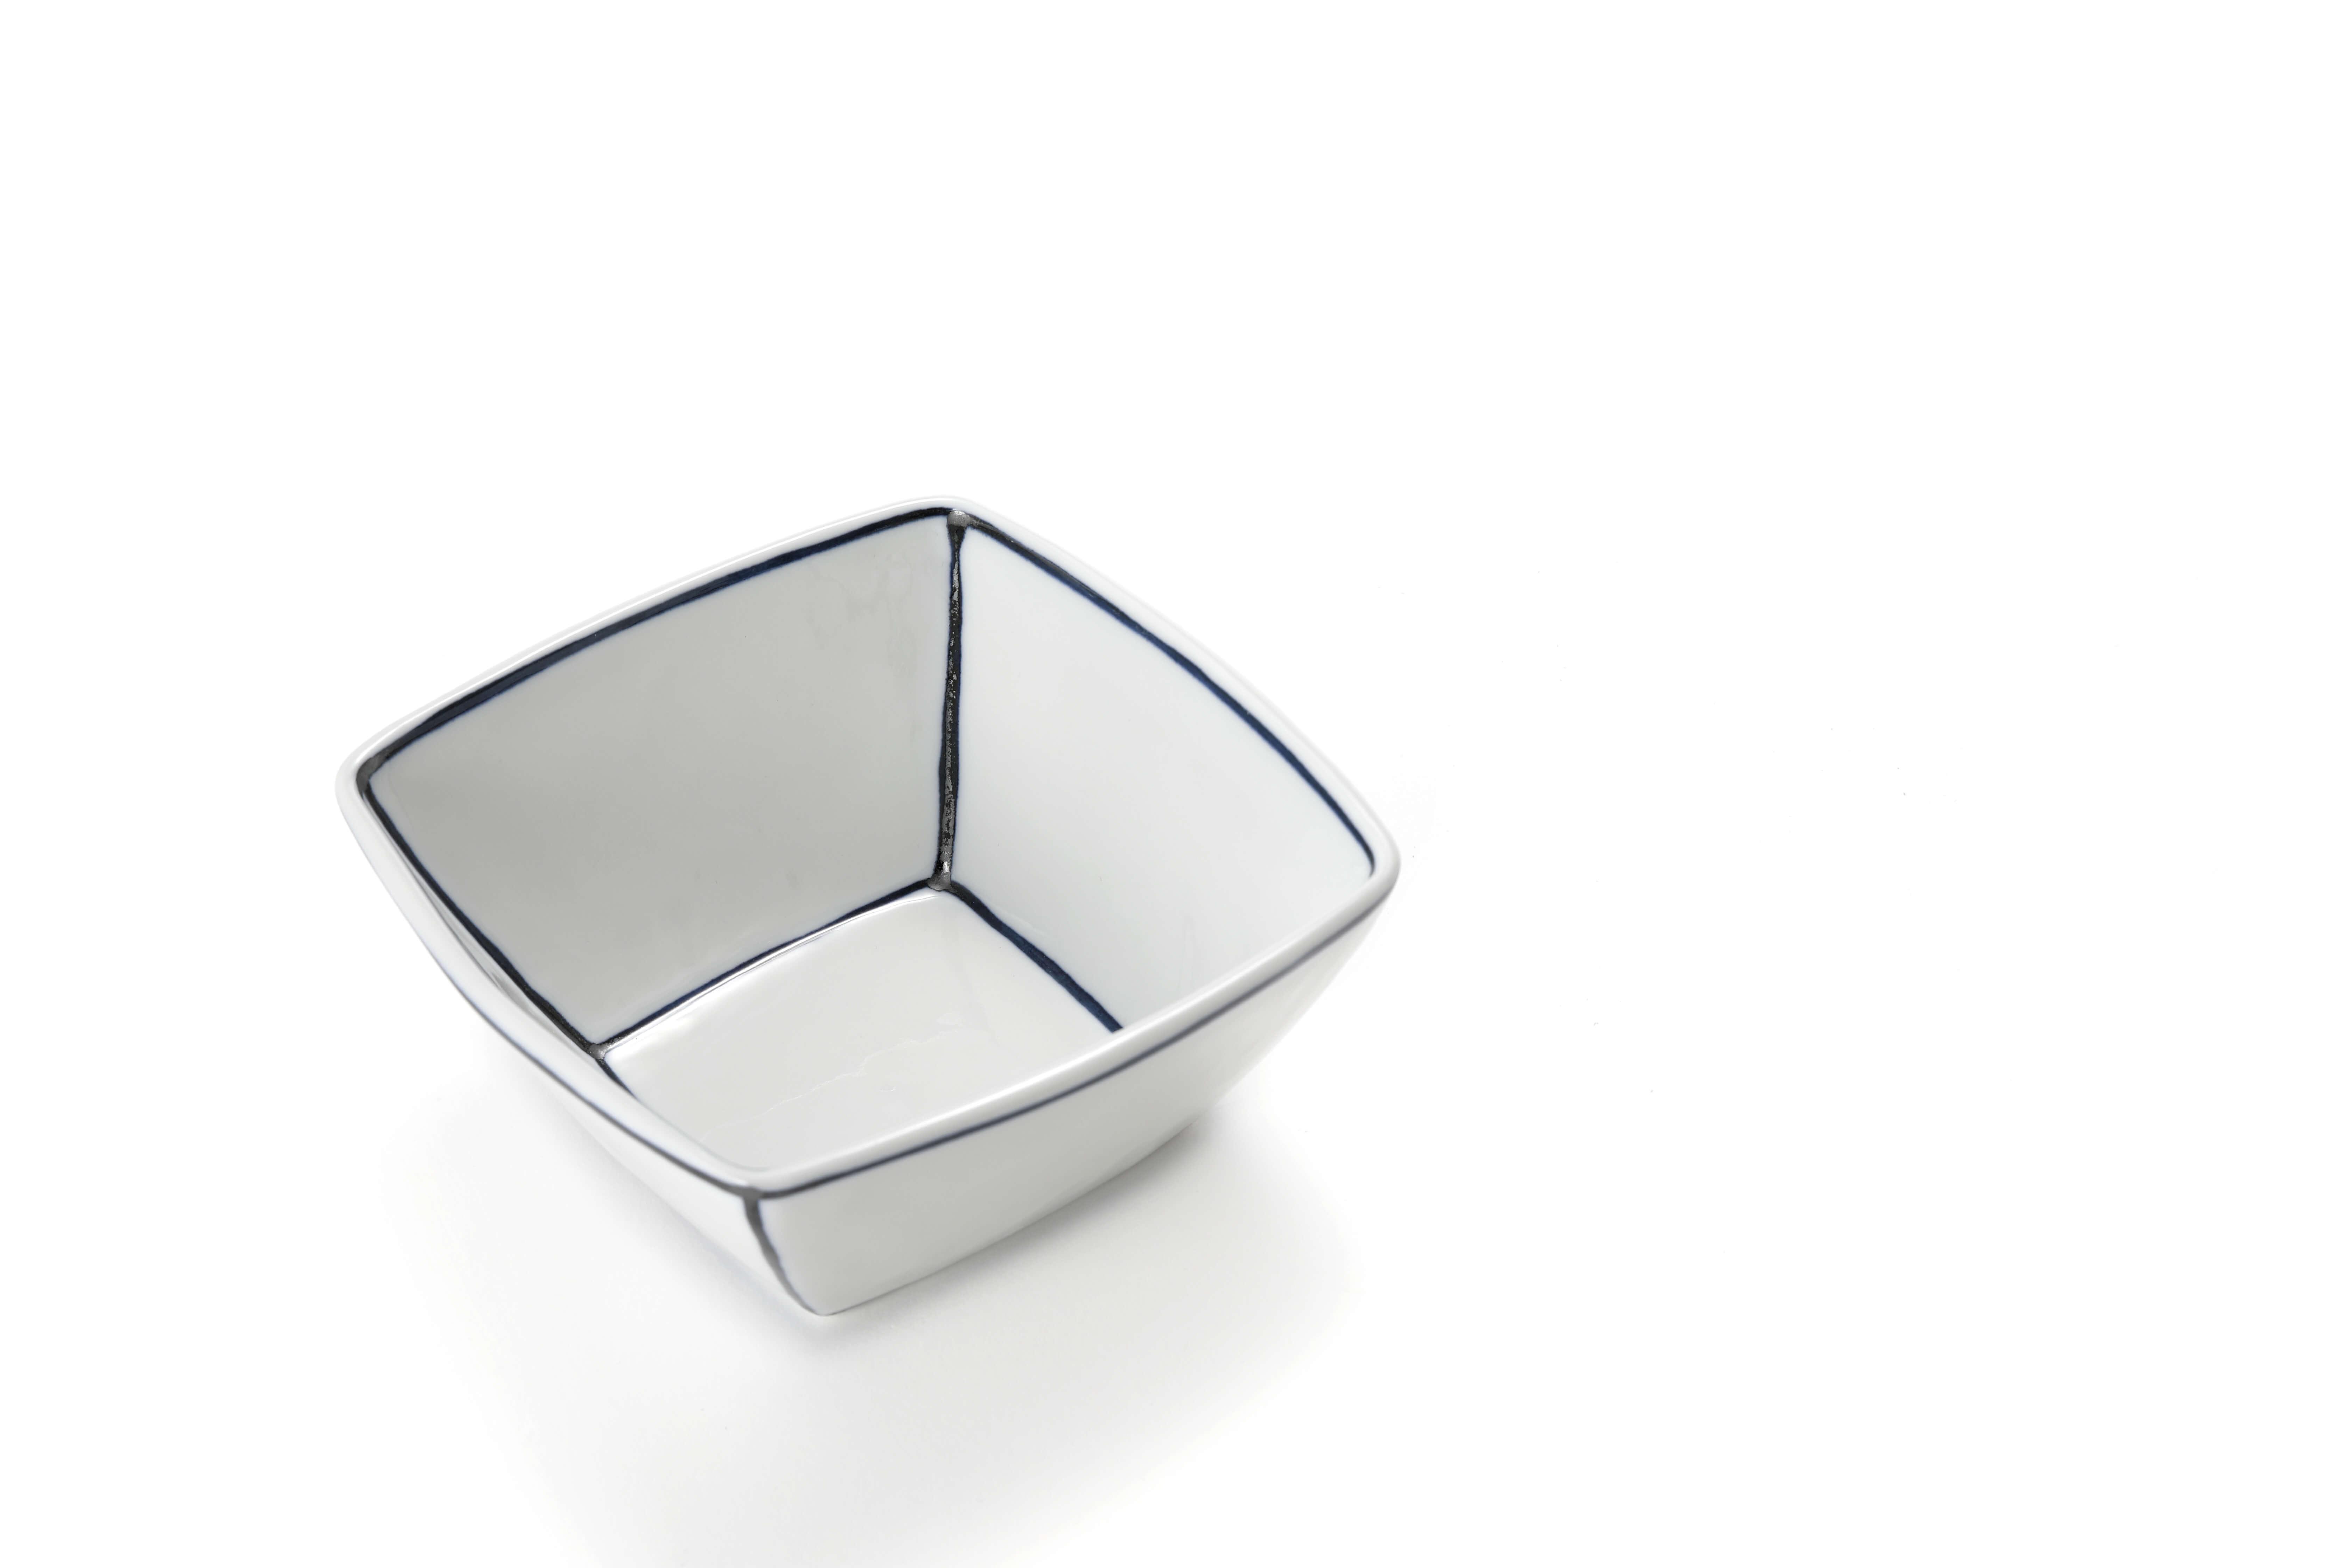 Handmade Ceramic Square Salad Bowl